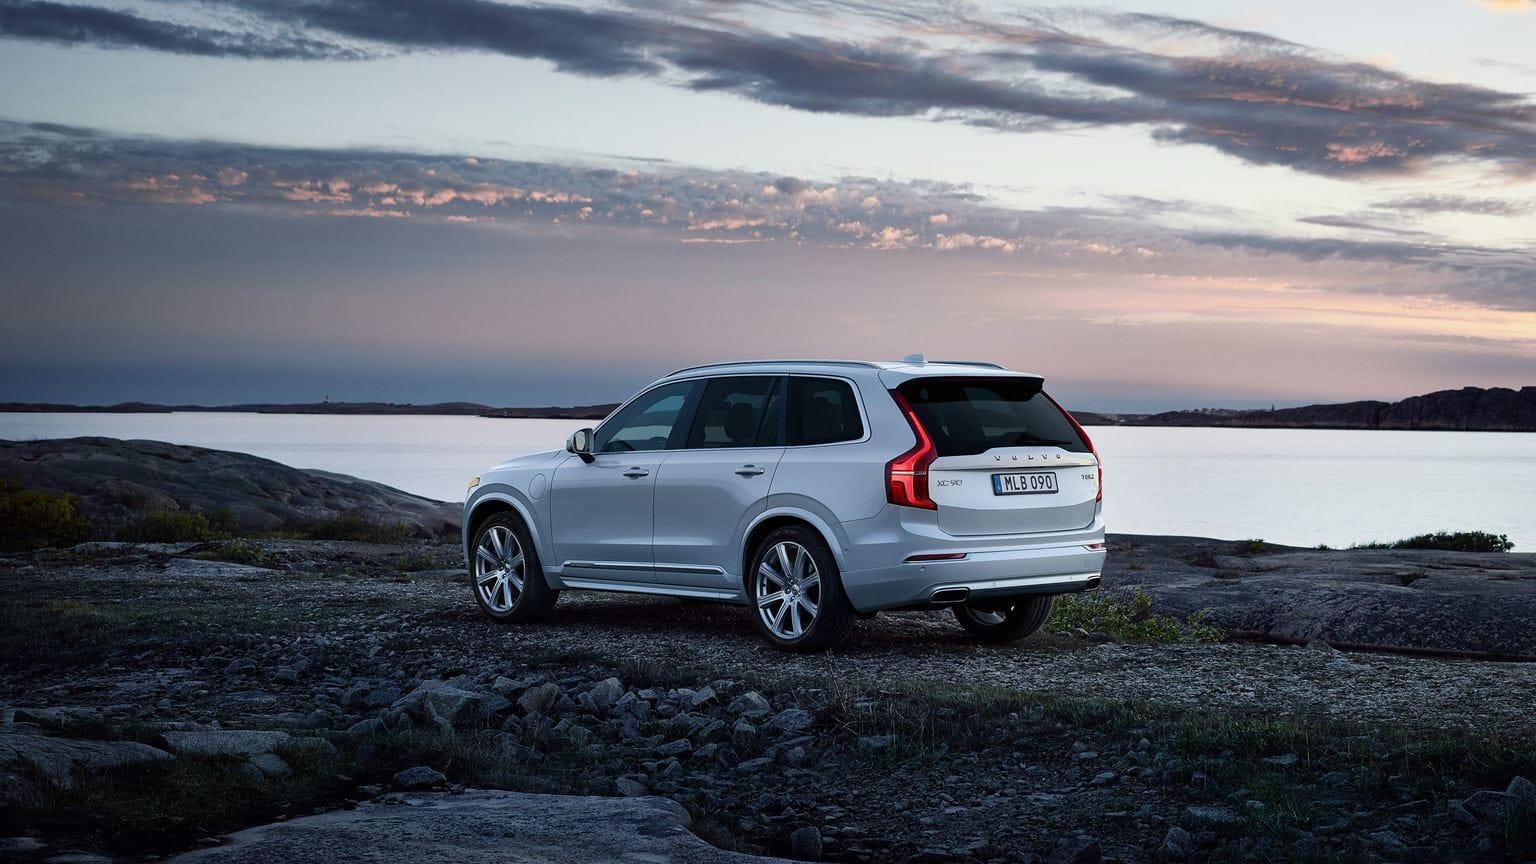 Luxury Suv Face Off 2019 Volvo Xc90 Vs Lexus Rx Volvo Cars Silver